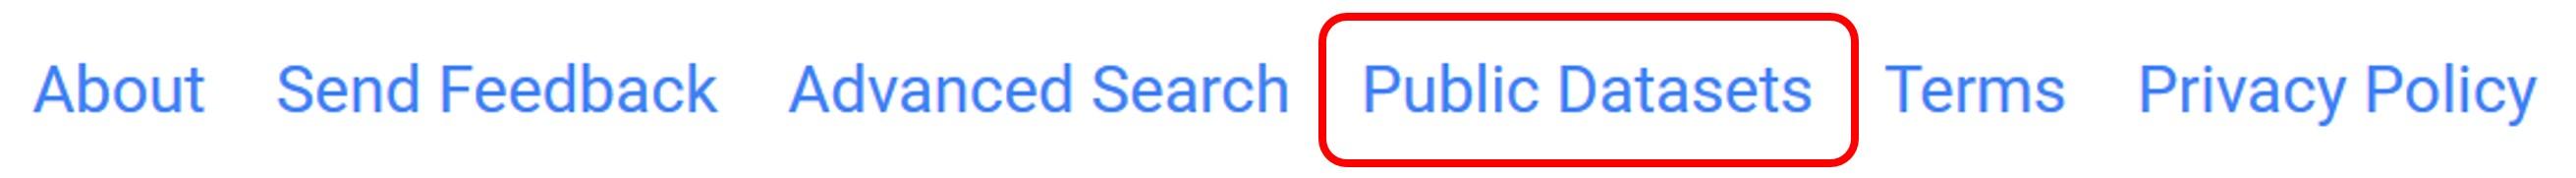 Google Patents Public Datasets Link